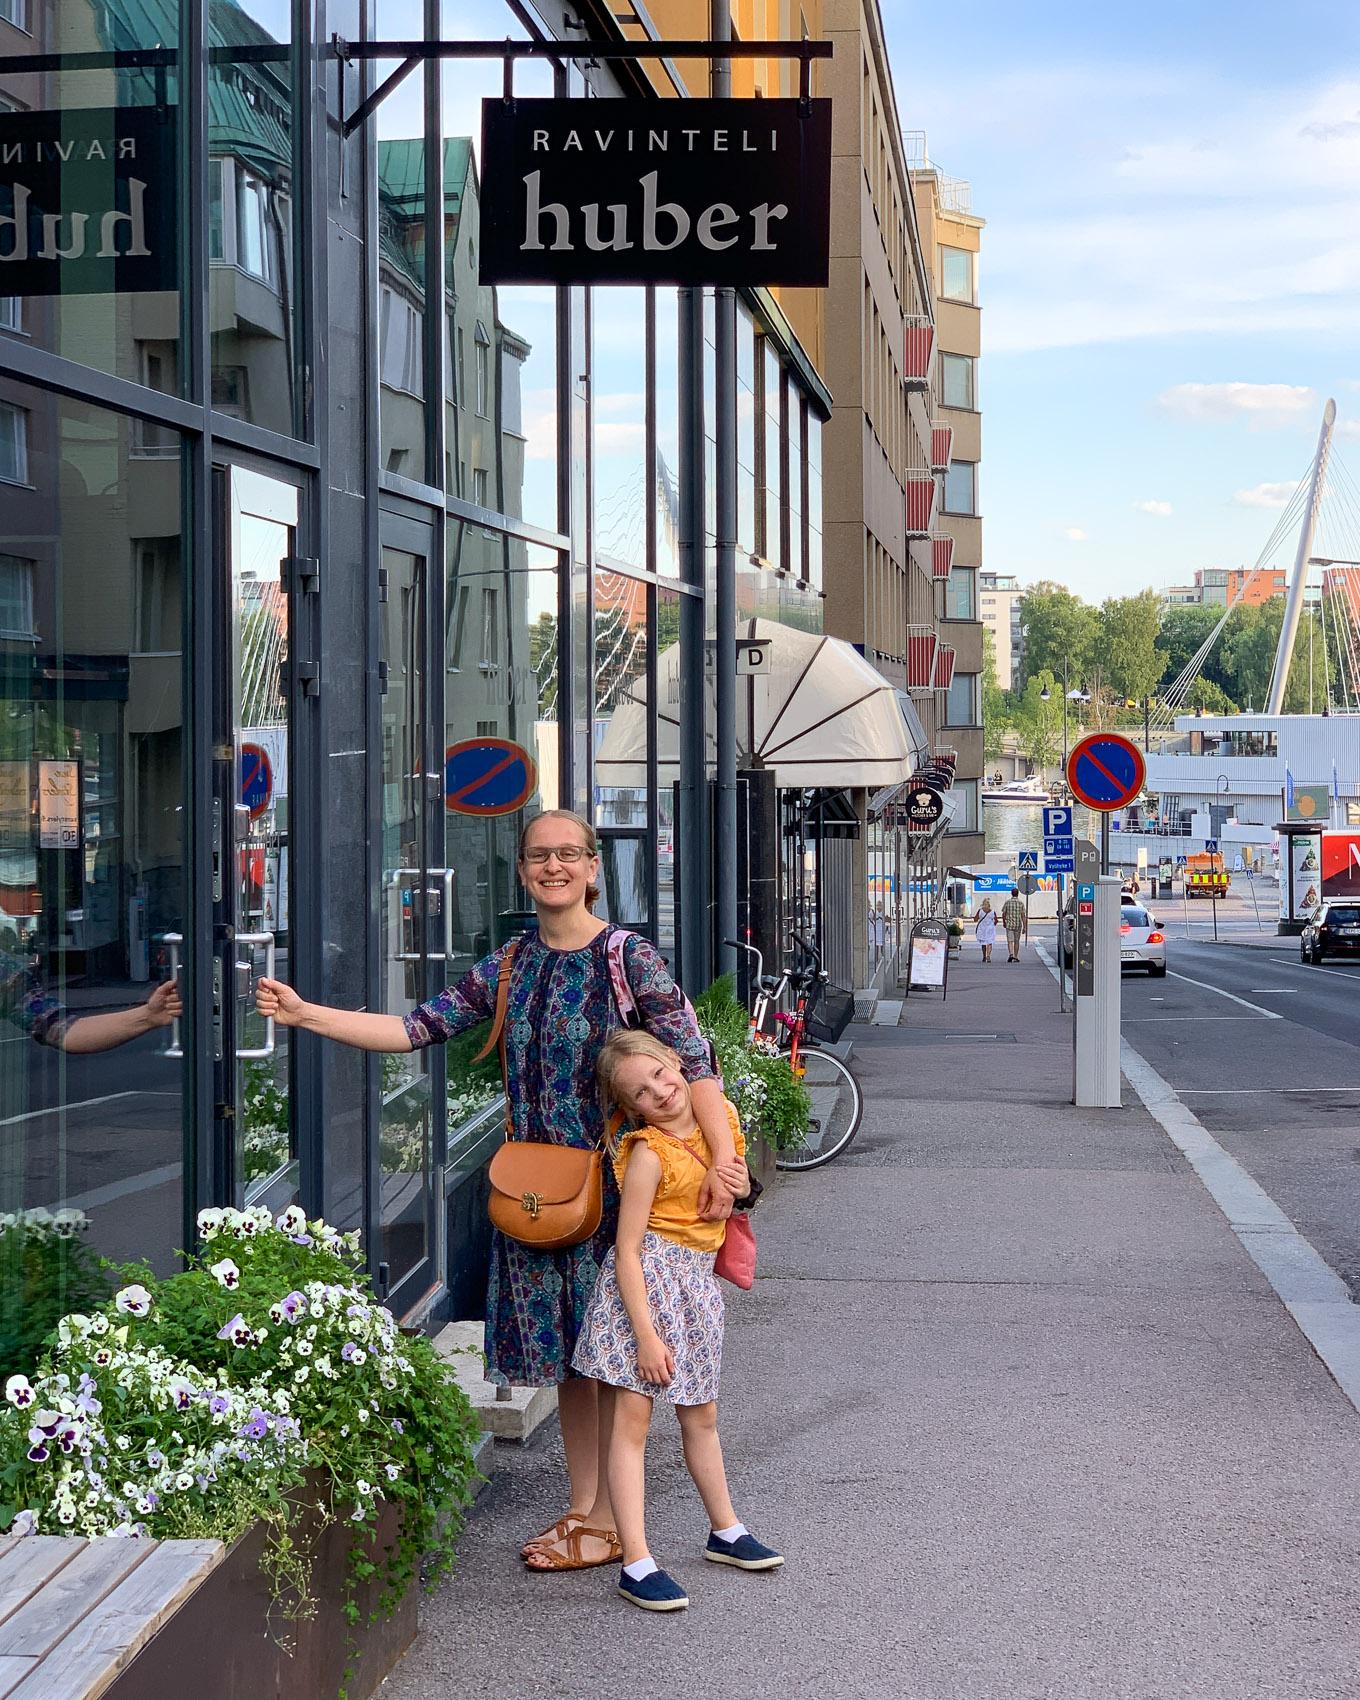 3 x syö Tampereella: Ravinteli Huber, Café Pispala ja Pizzeria Luca